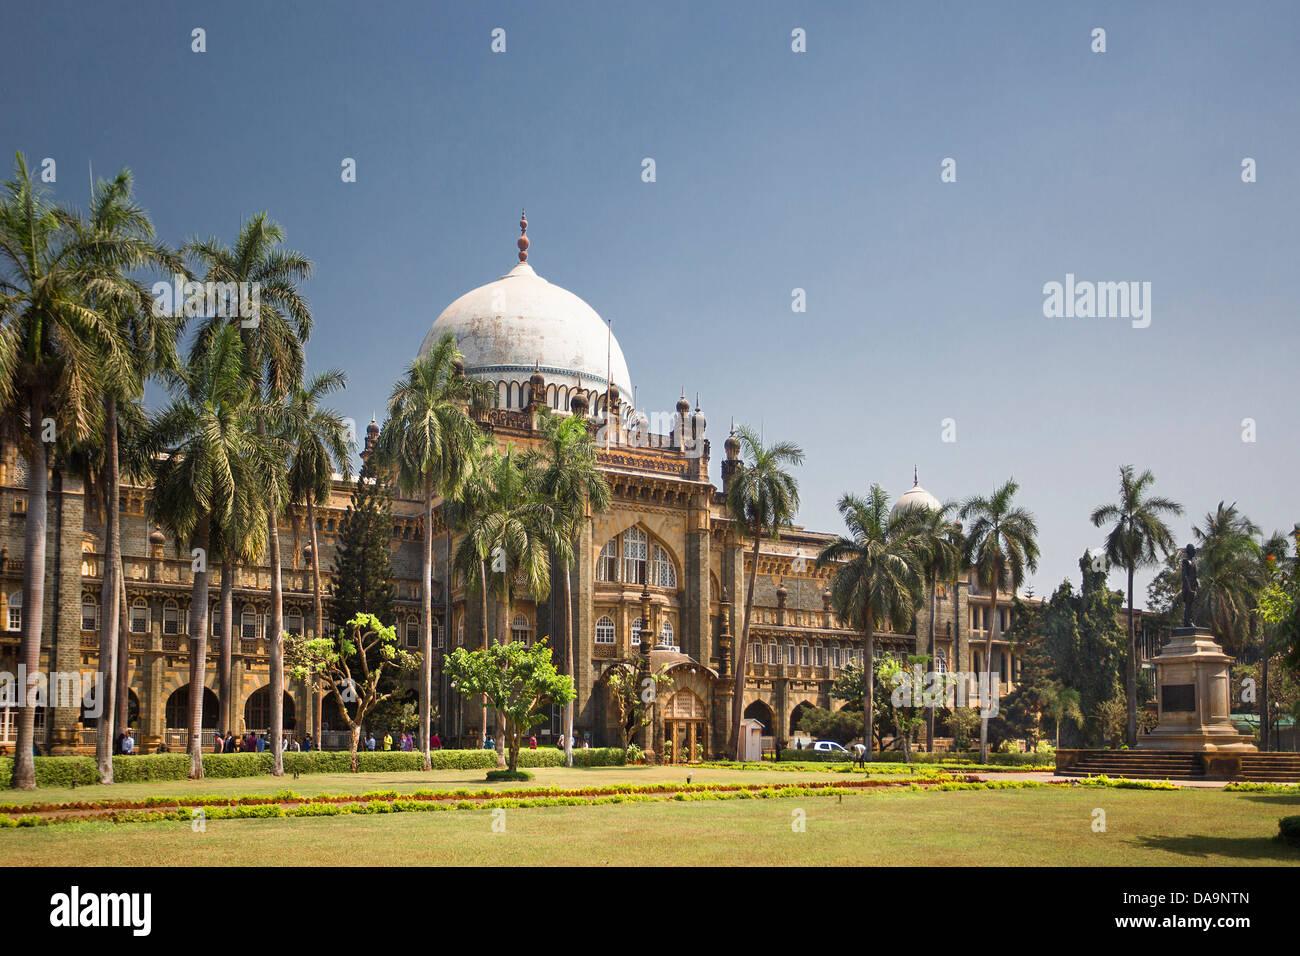 India, South India, Asia, Maharashtra, Mumbai, Bombay, City, Prince of Wales Museum, Prince of Wales, architecture, - Stock Image